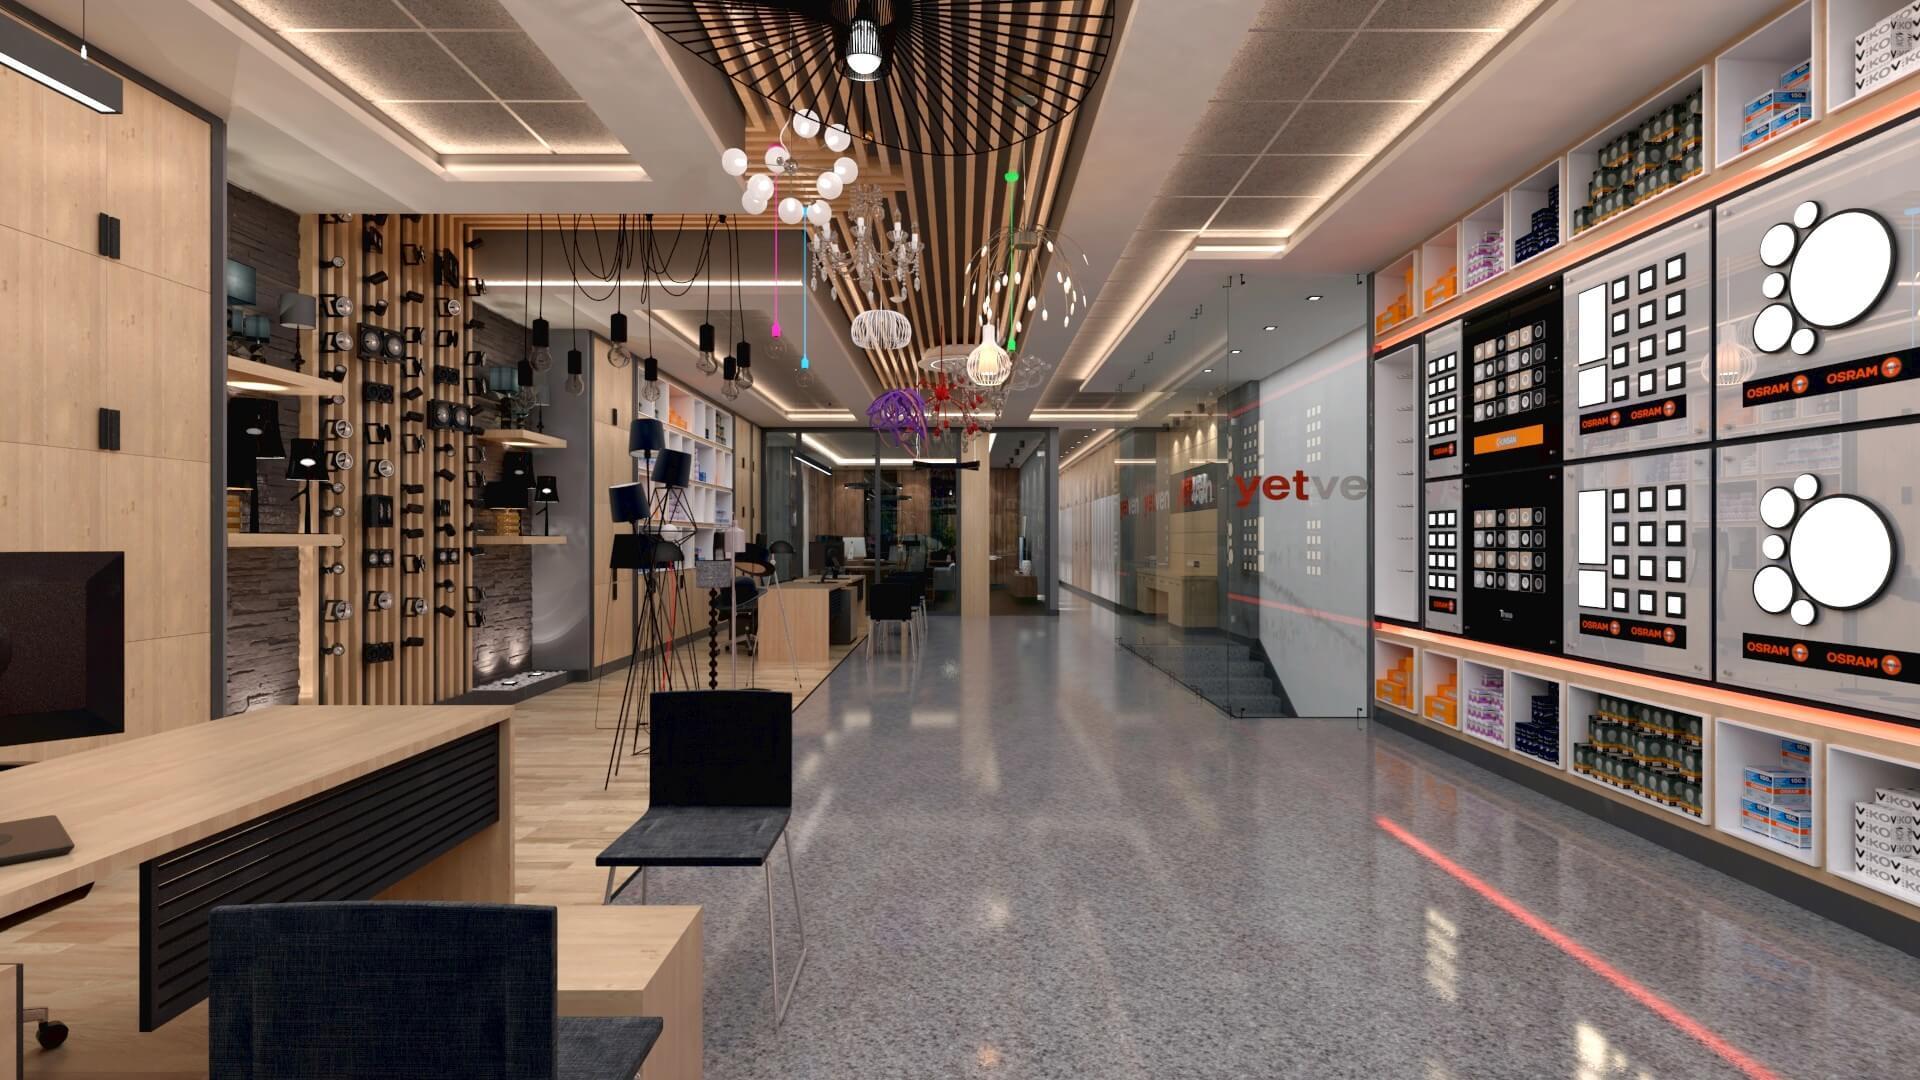 Retail Shop Design Interior Architecture Yetven Electric / Ostim